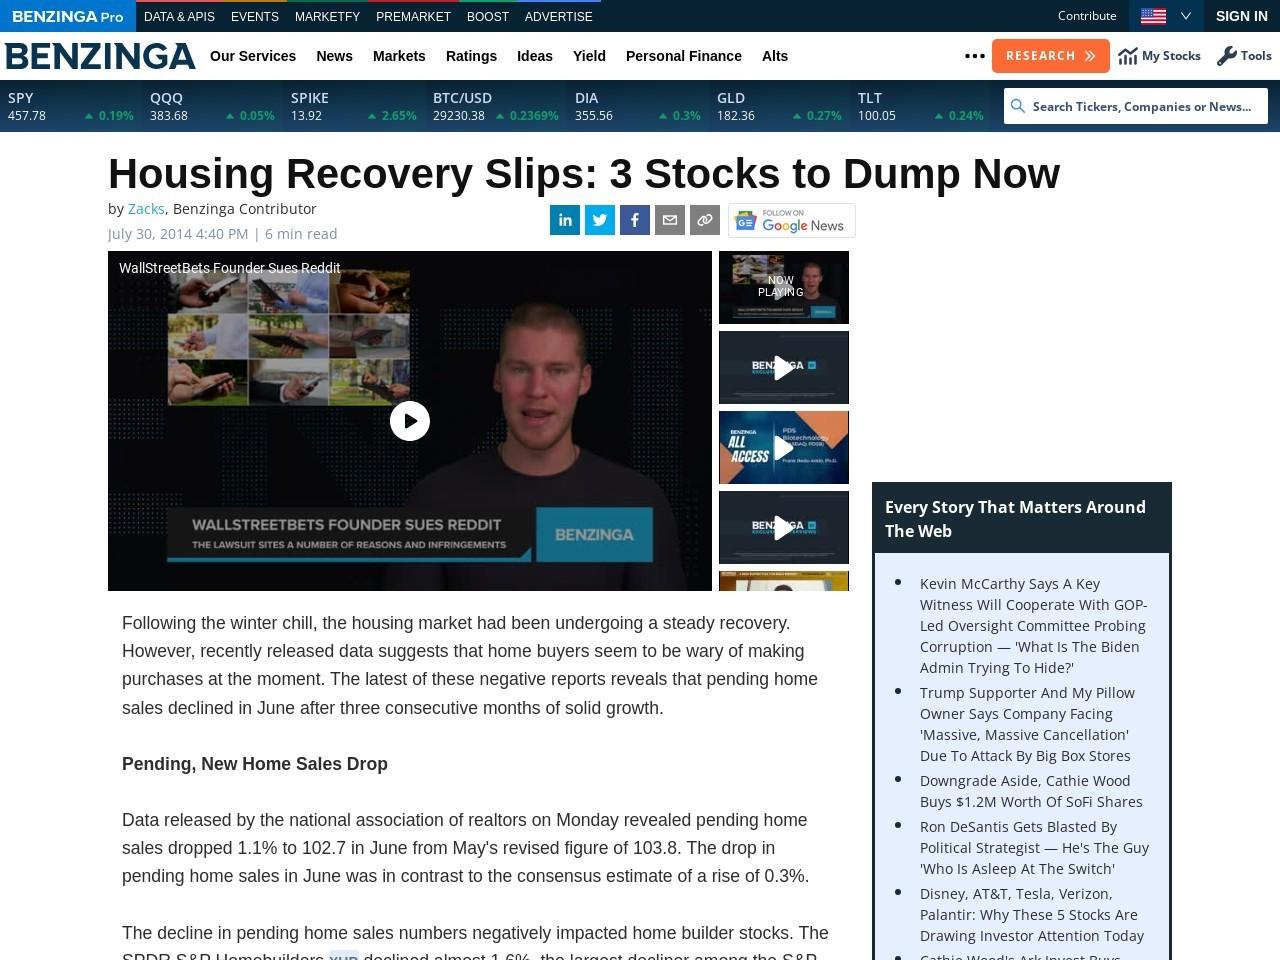 Housing Recovery Slips: 3 Stocks to Dump Now | Benzinga